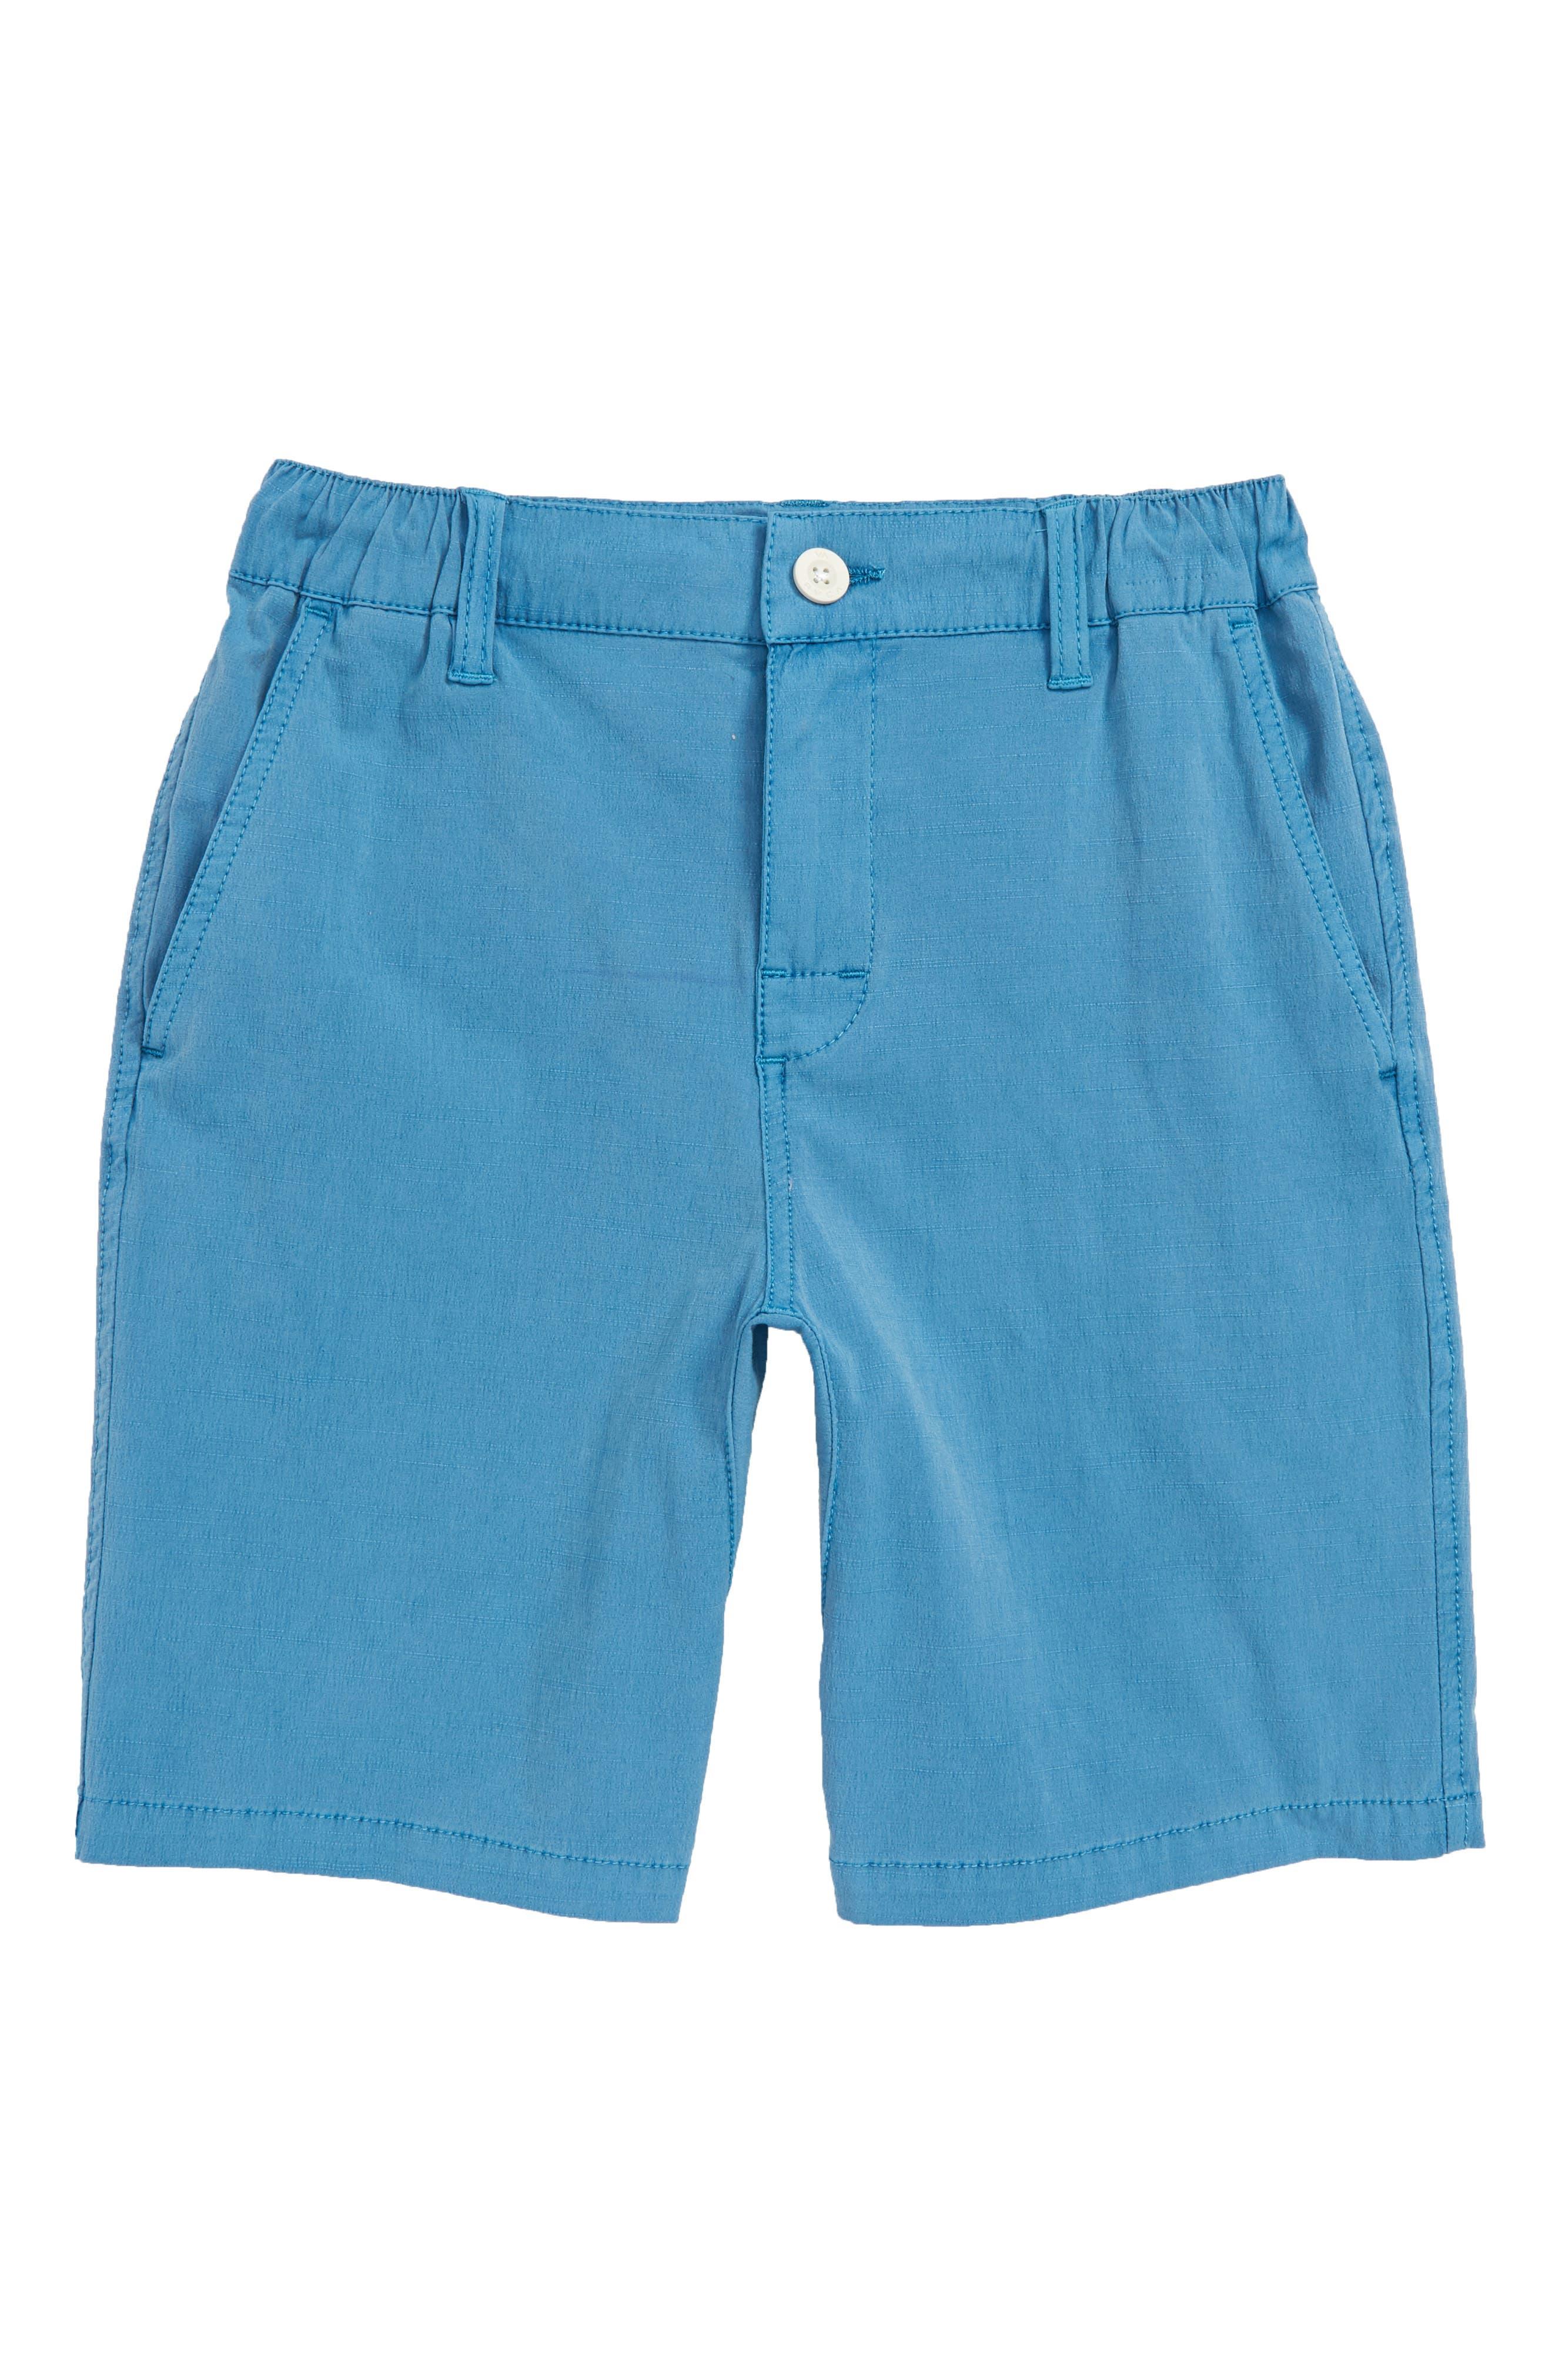 All Time Coastal SOL Hybrid Shorts,                         Main,                         color, LAGOON